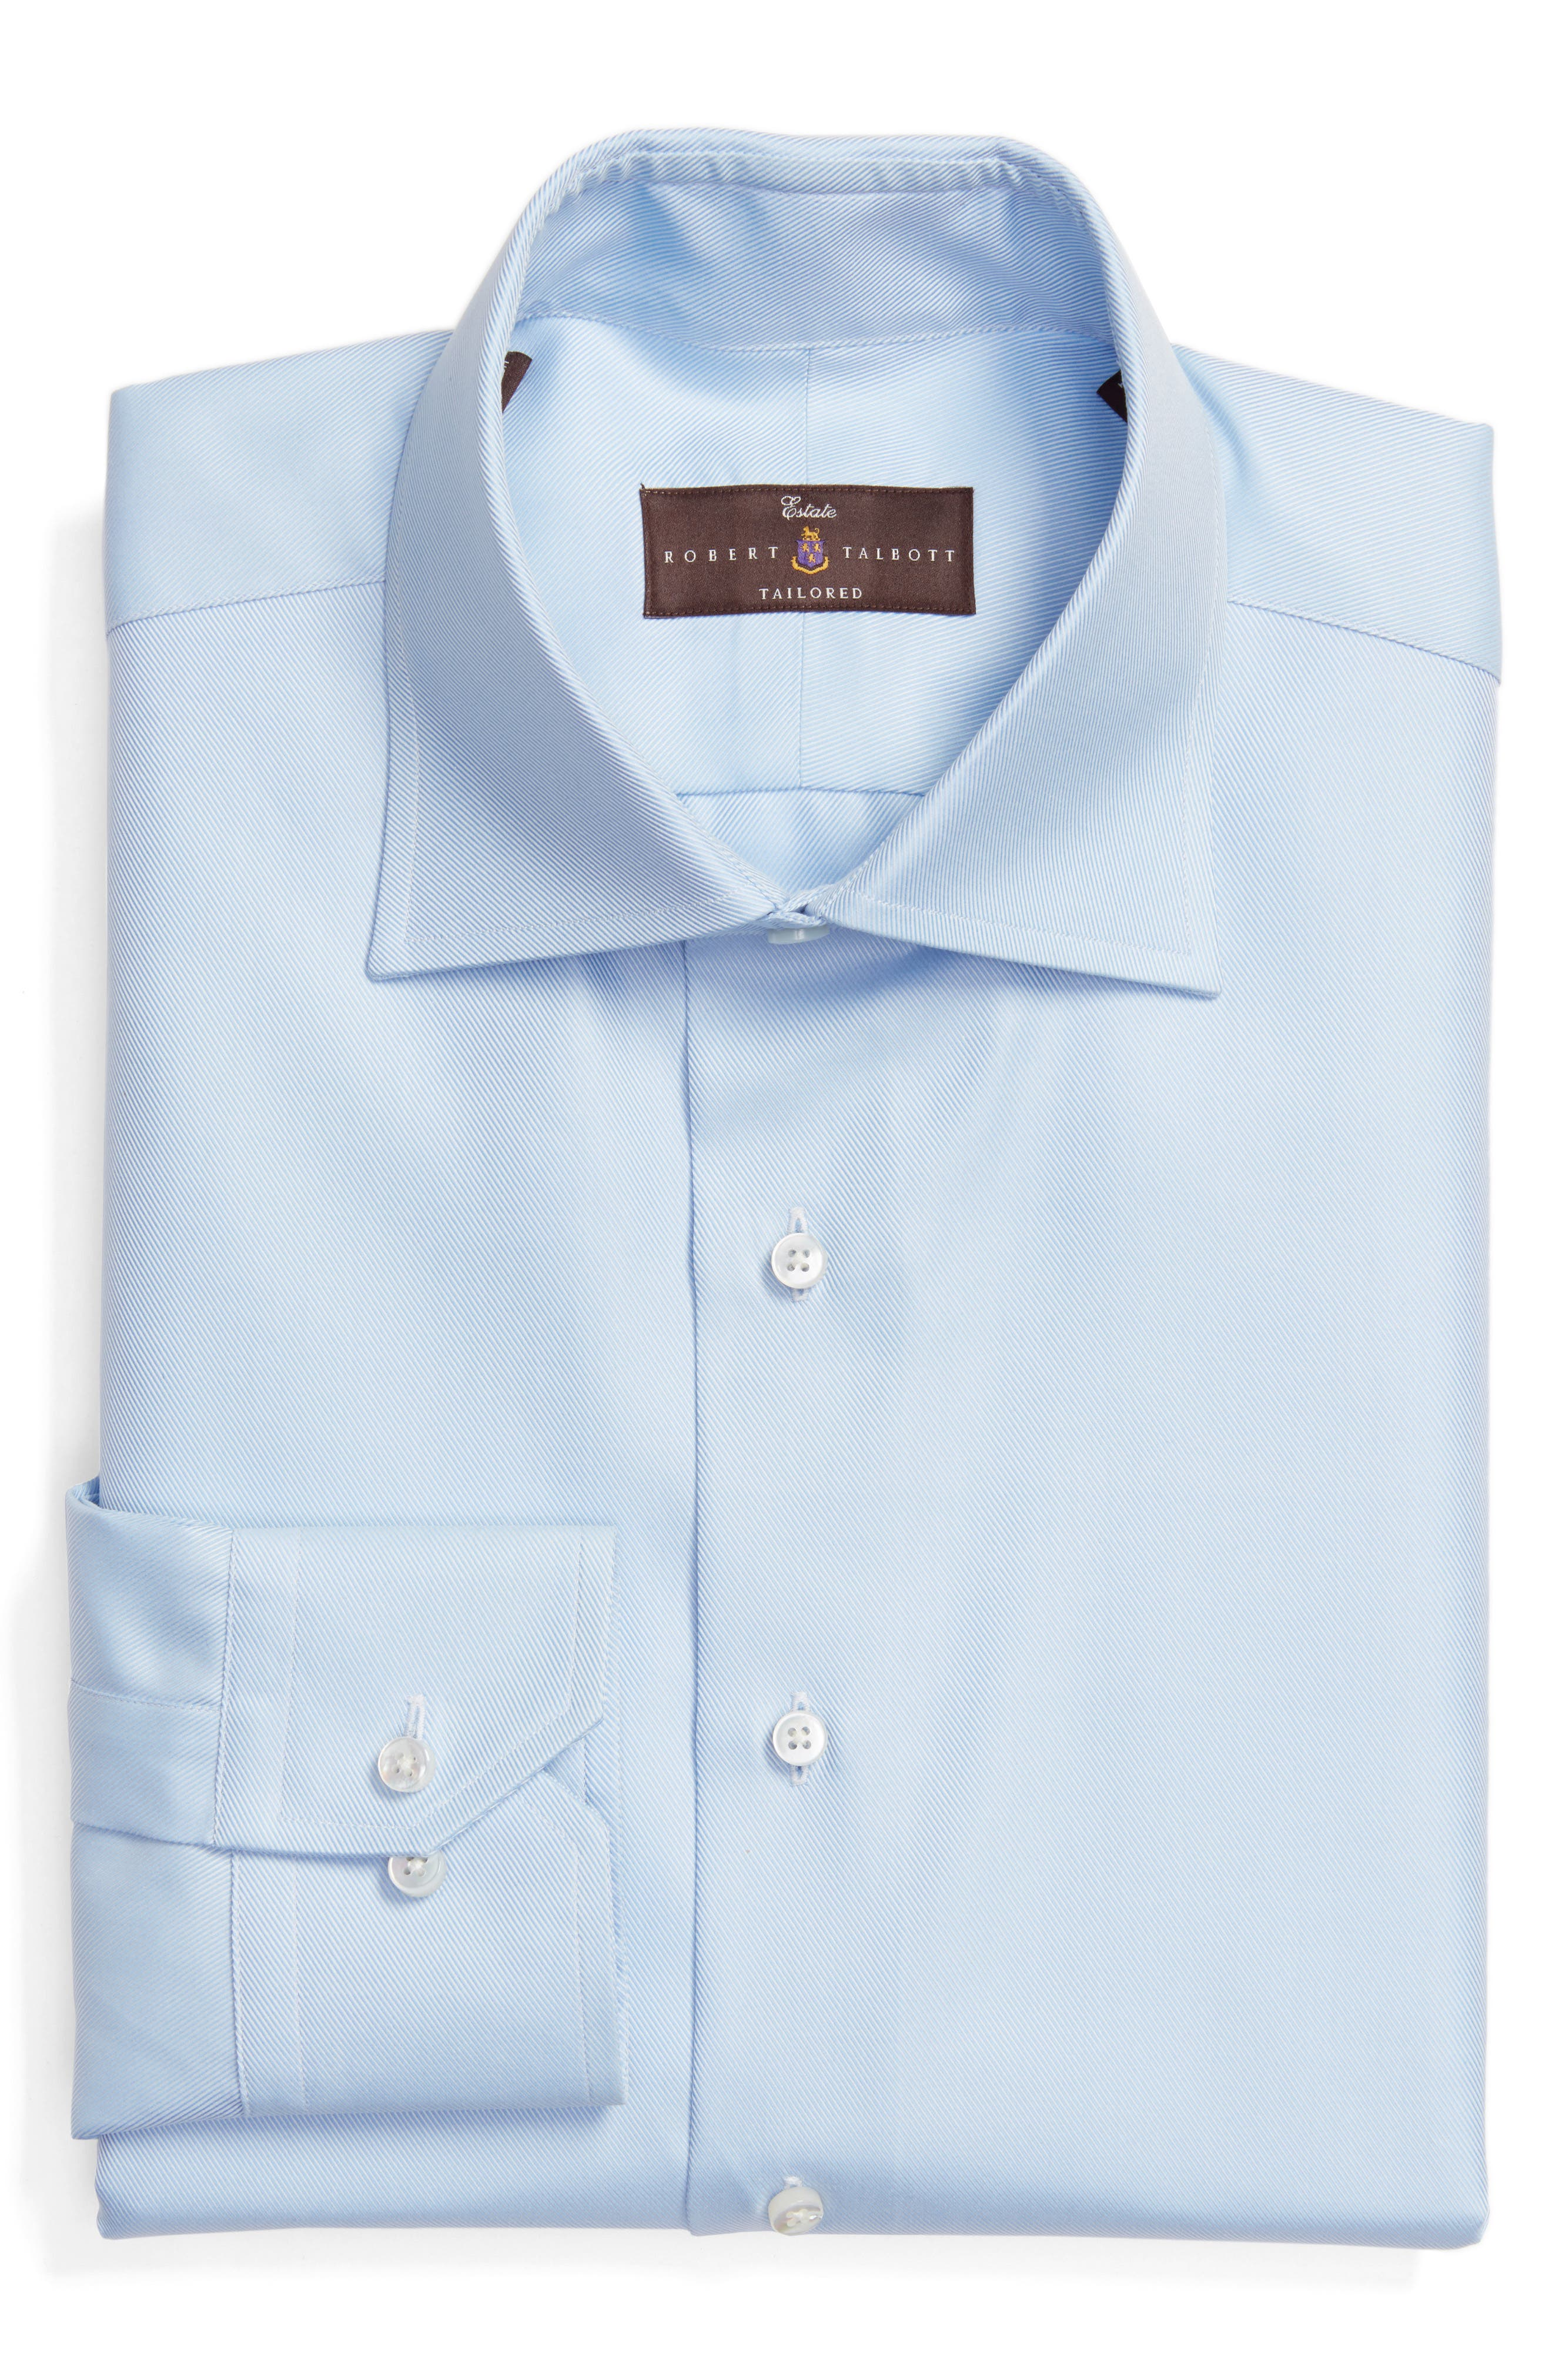 Main Image - Robert Talbott Tailored Fit Solid Dress Shirt